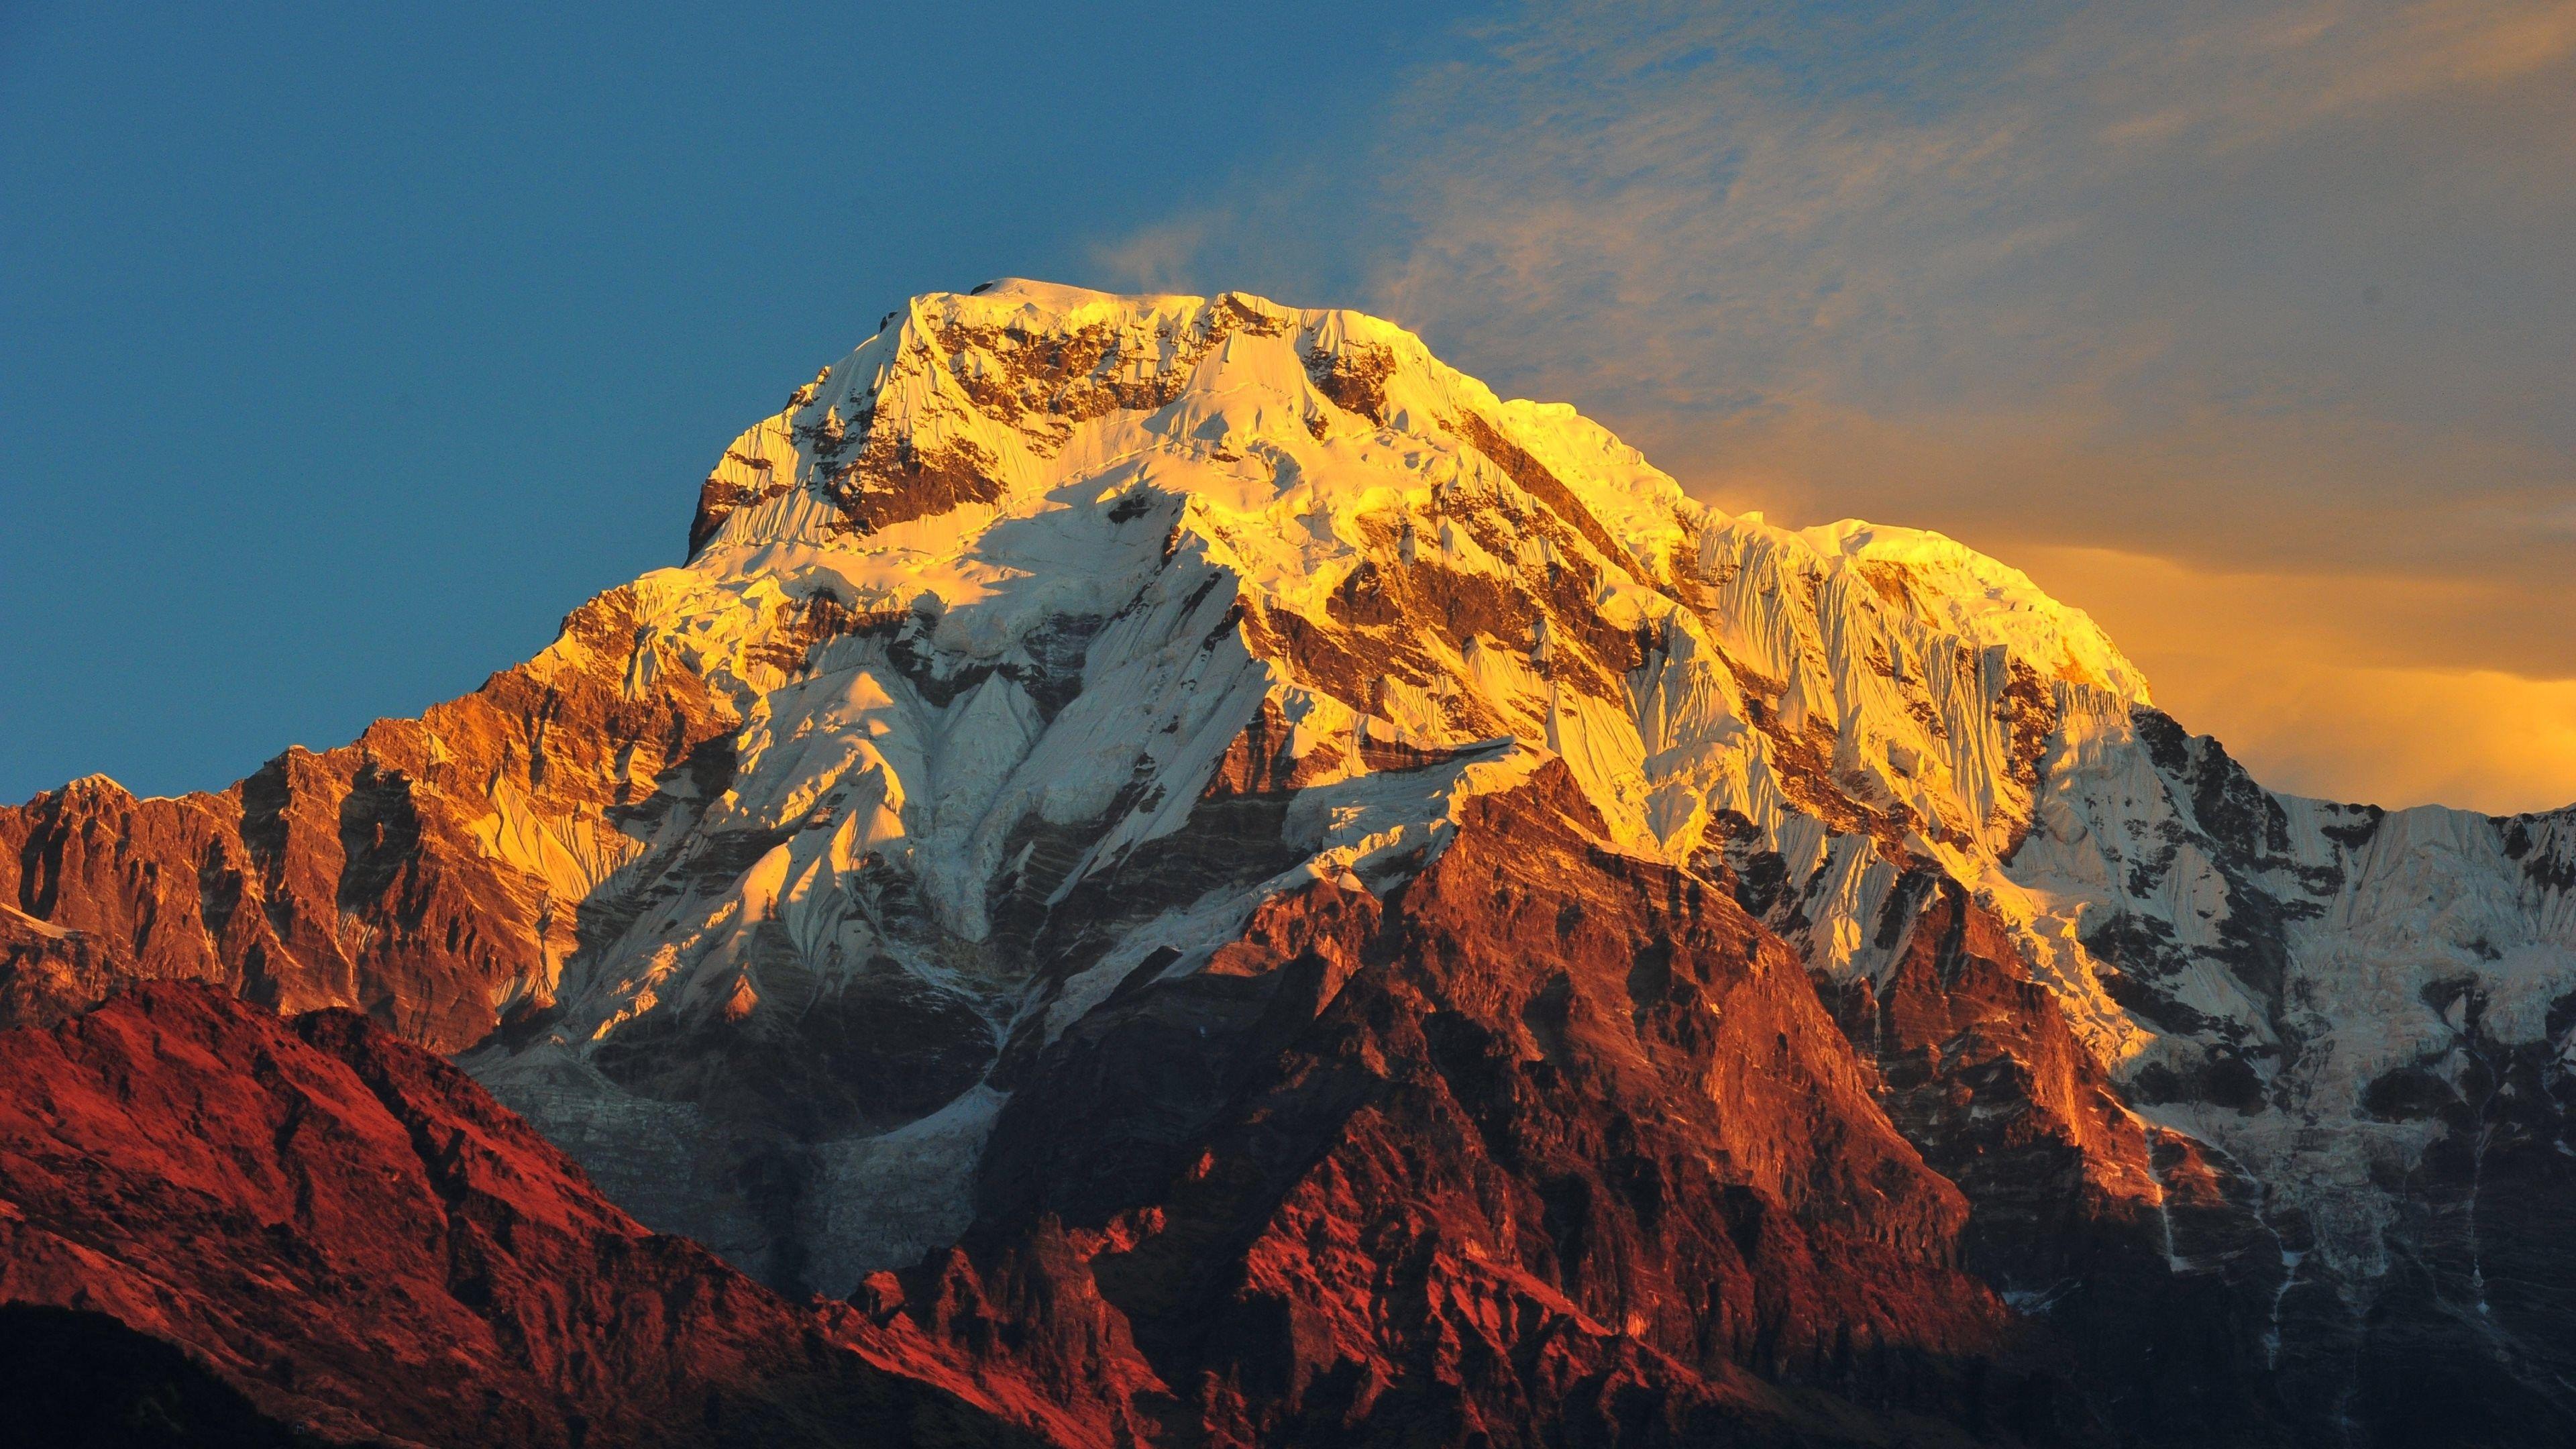 Desktop Backgrounds Mount Everest Backround 1358 Kb Jarrell Edwards Paisagem De Montanha Nave Espacial Desenho Wallpapers Natureza